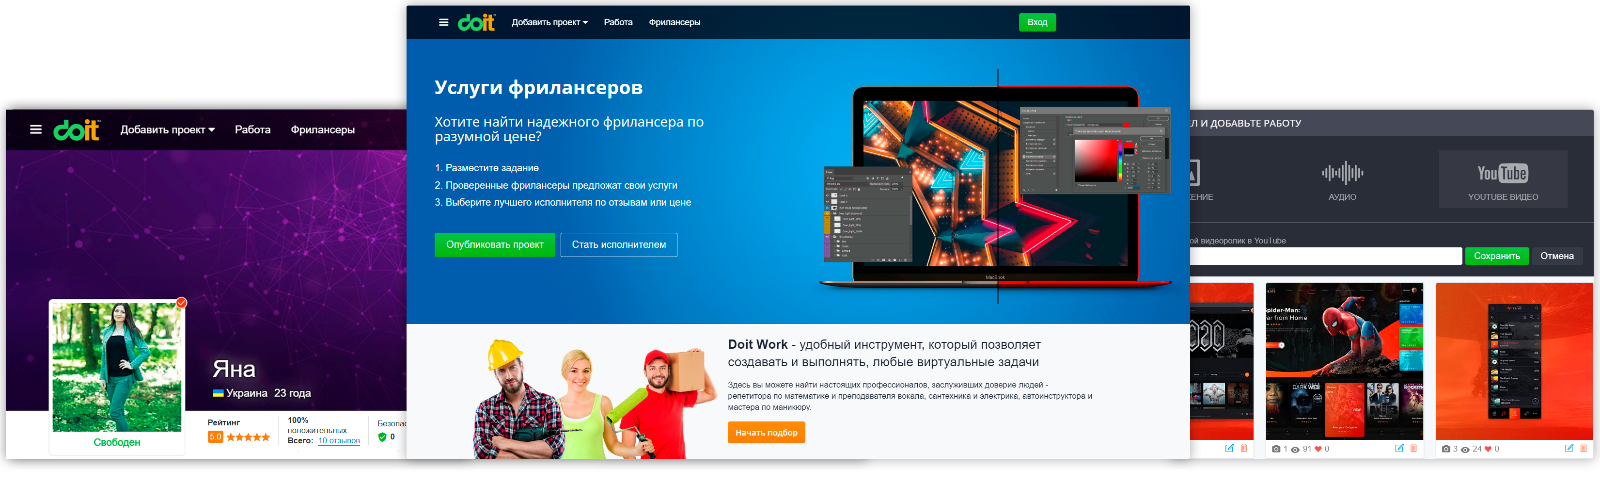 фрилансеры украины сайты